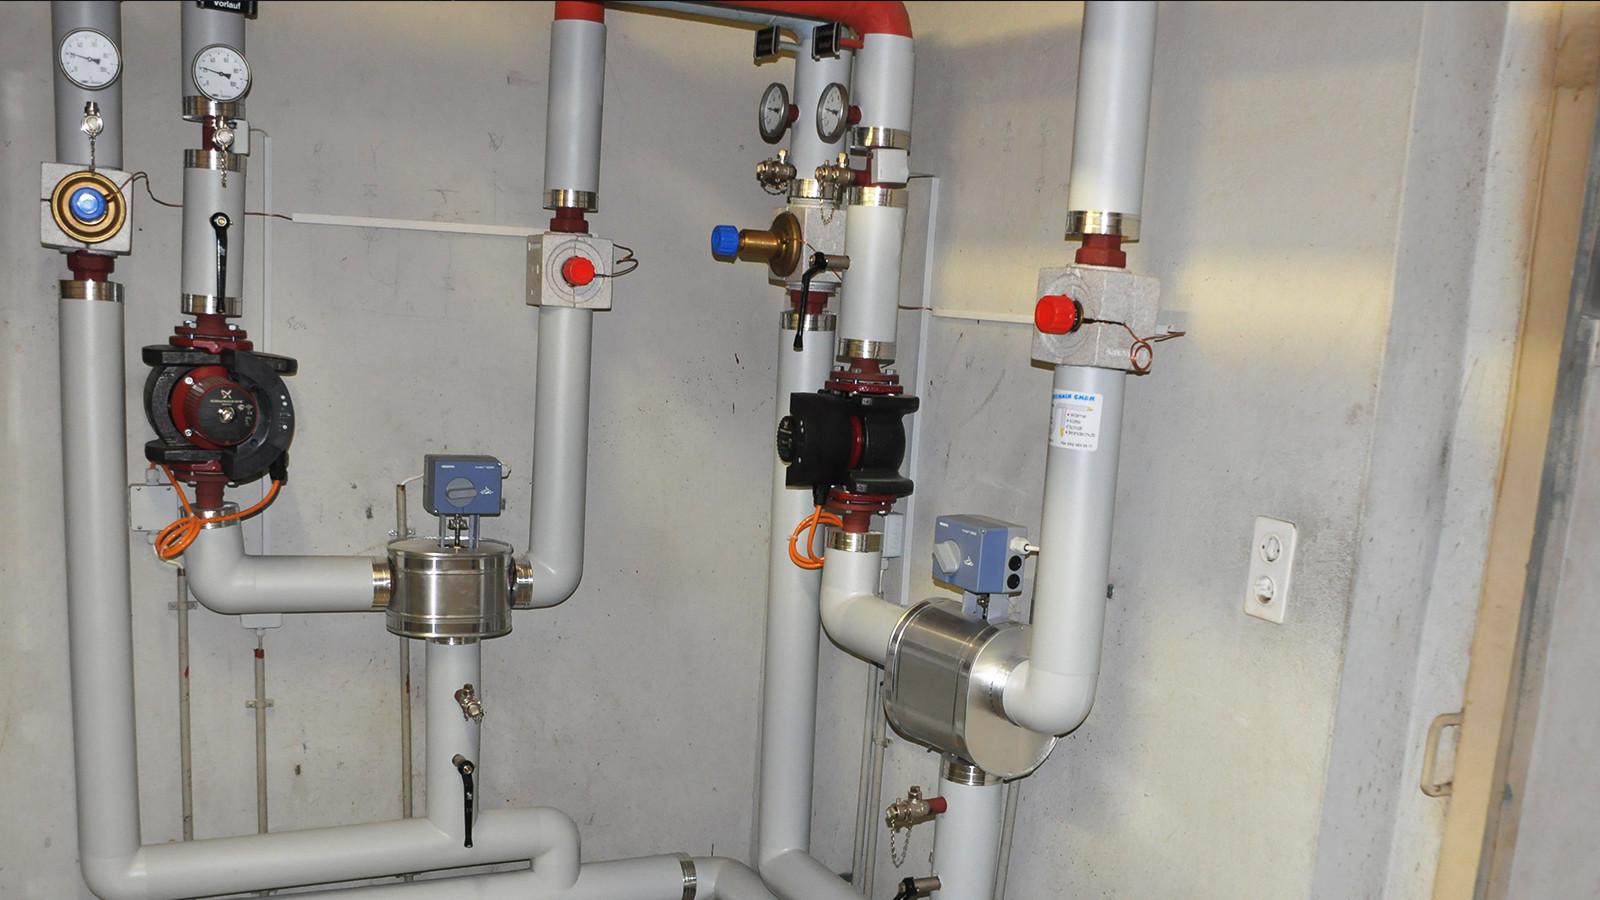 Heizungsunterstation mit PIR-PVC- gedämmtee  Armaturen und Alublechummantelung